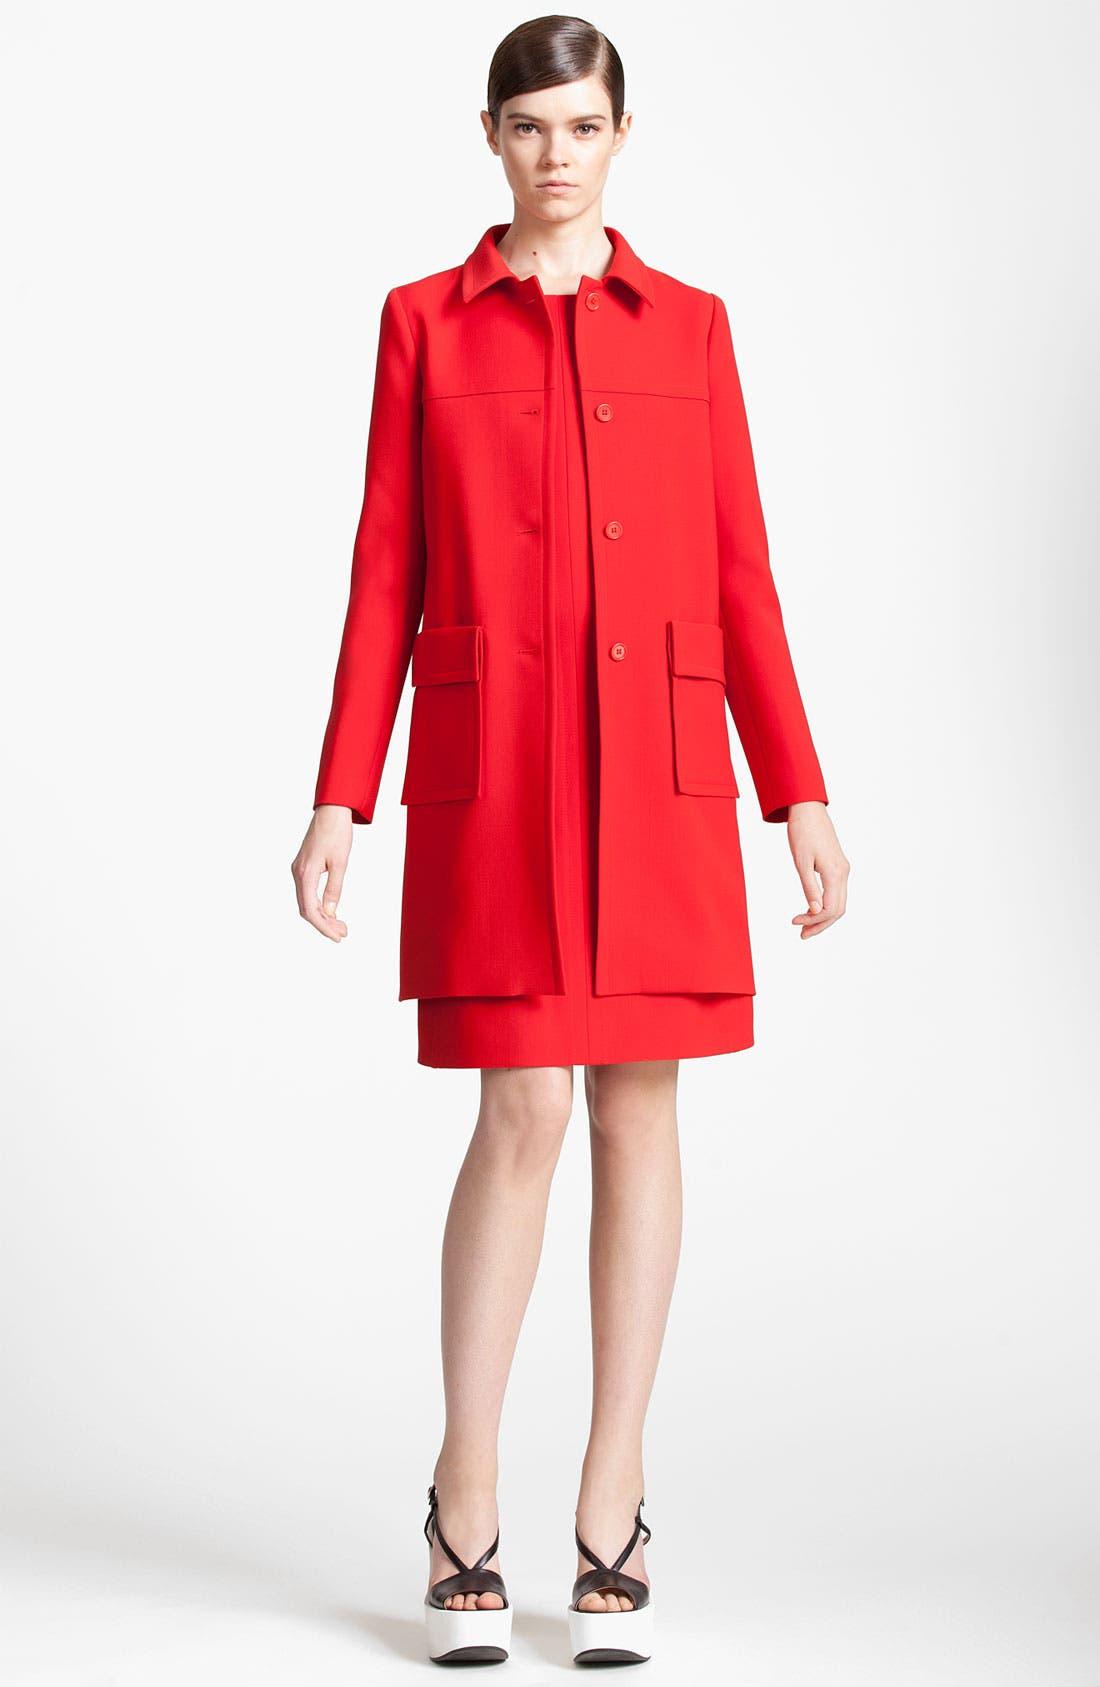 Alternate Image 1 Selected - Jil Sander Coat & Dress